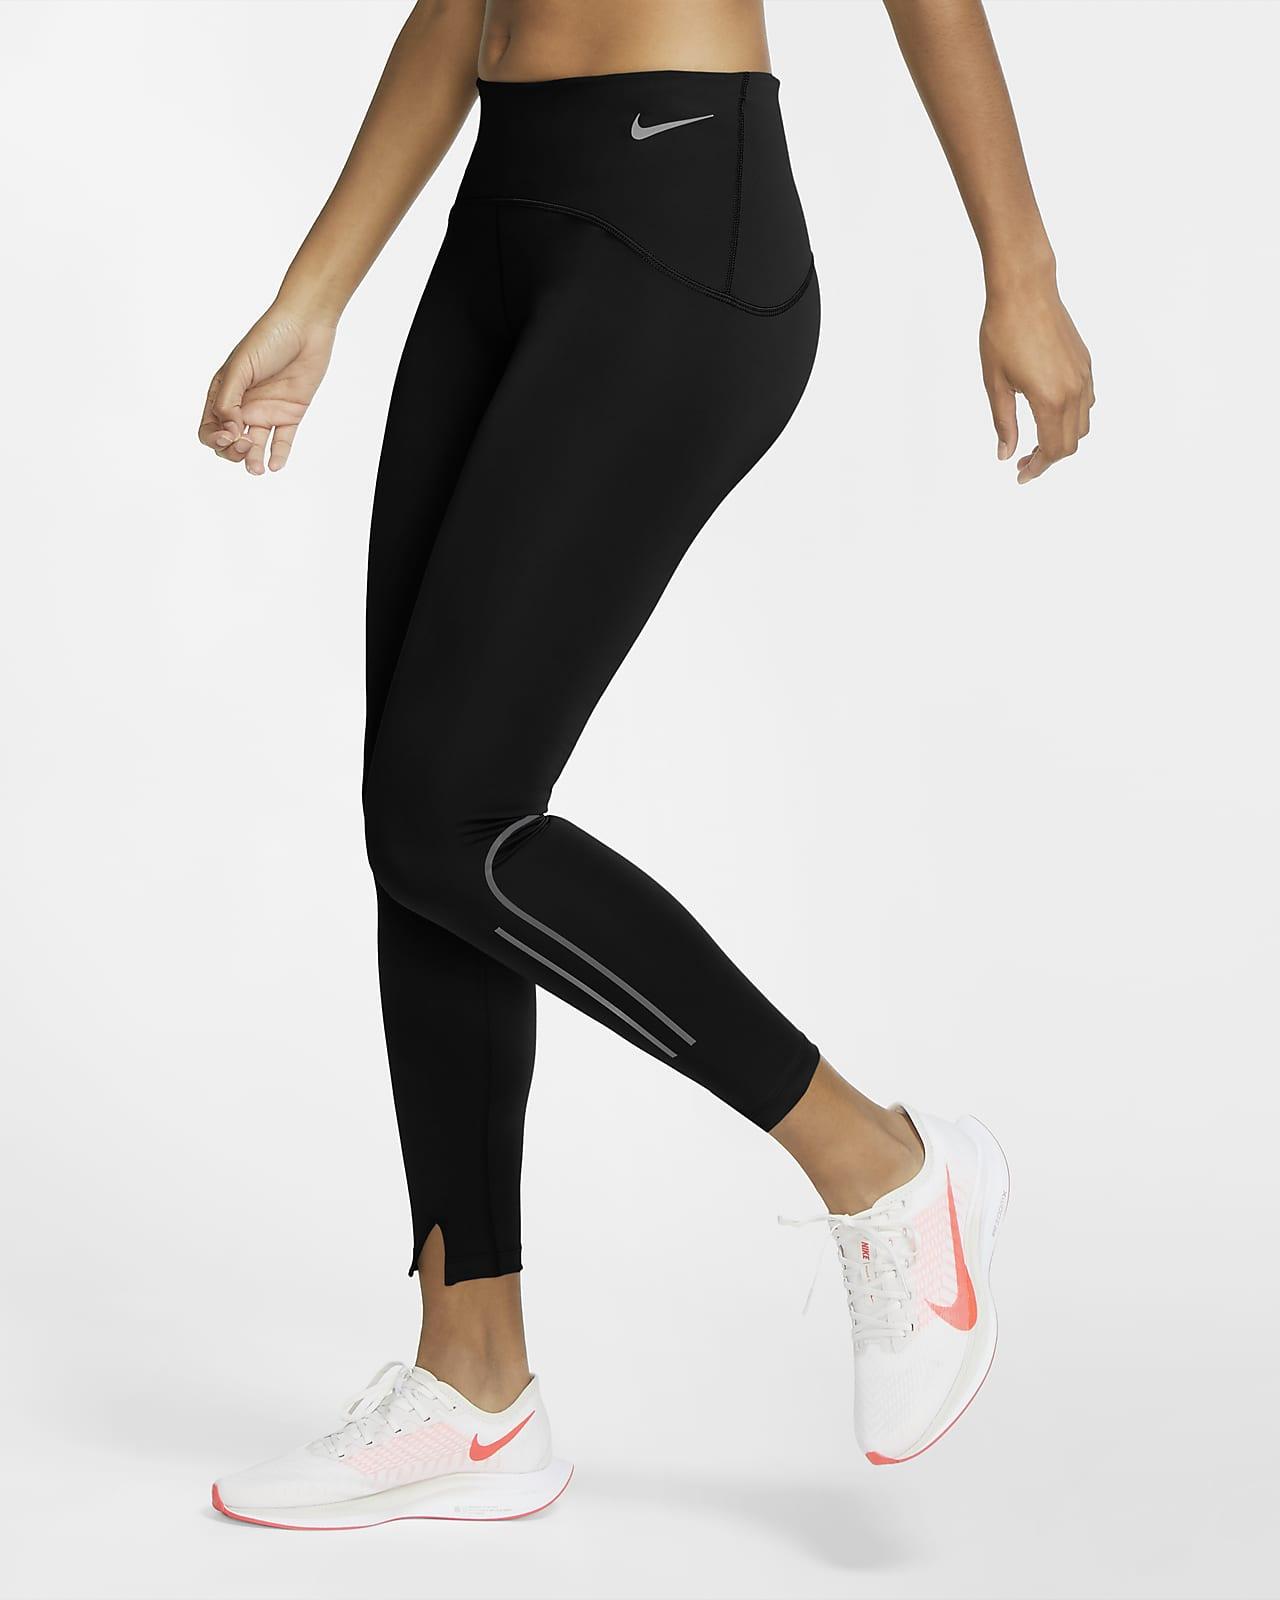 Mallas de running mate de 7/8 de largo para mujer Nike Speed